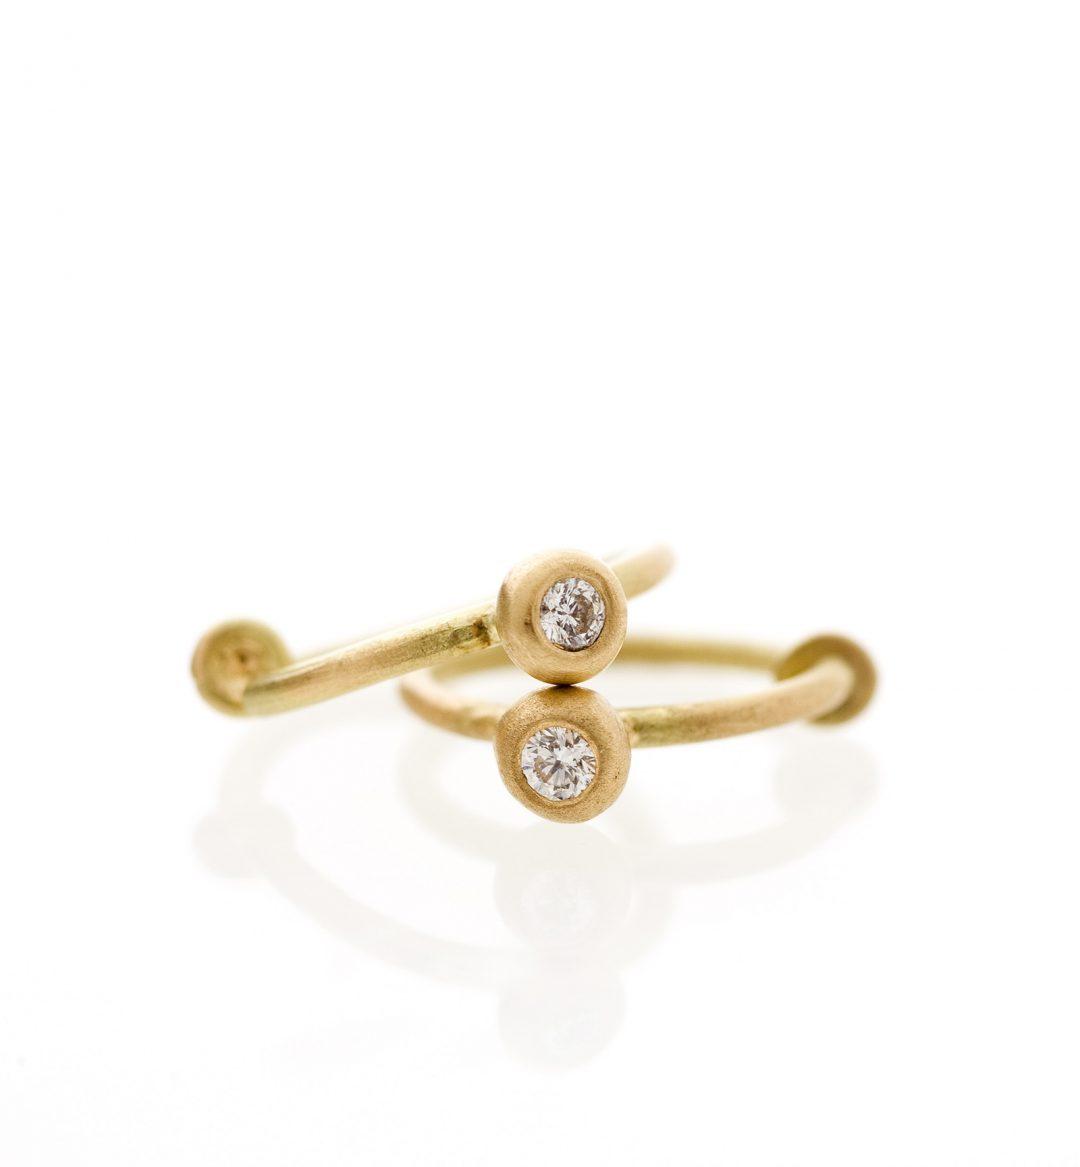 Caviar Earrings